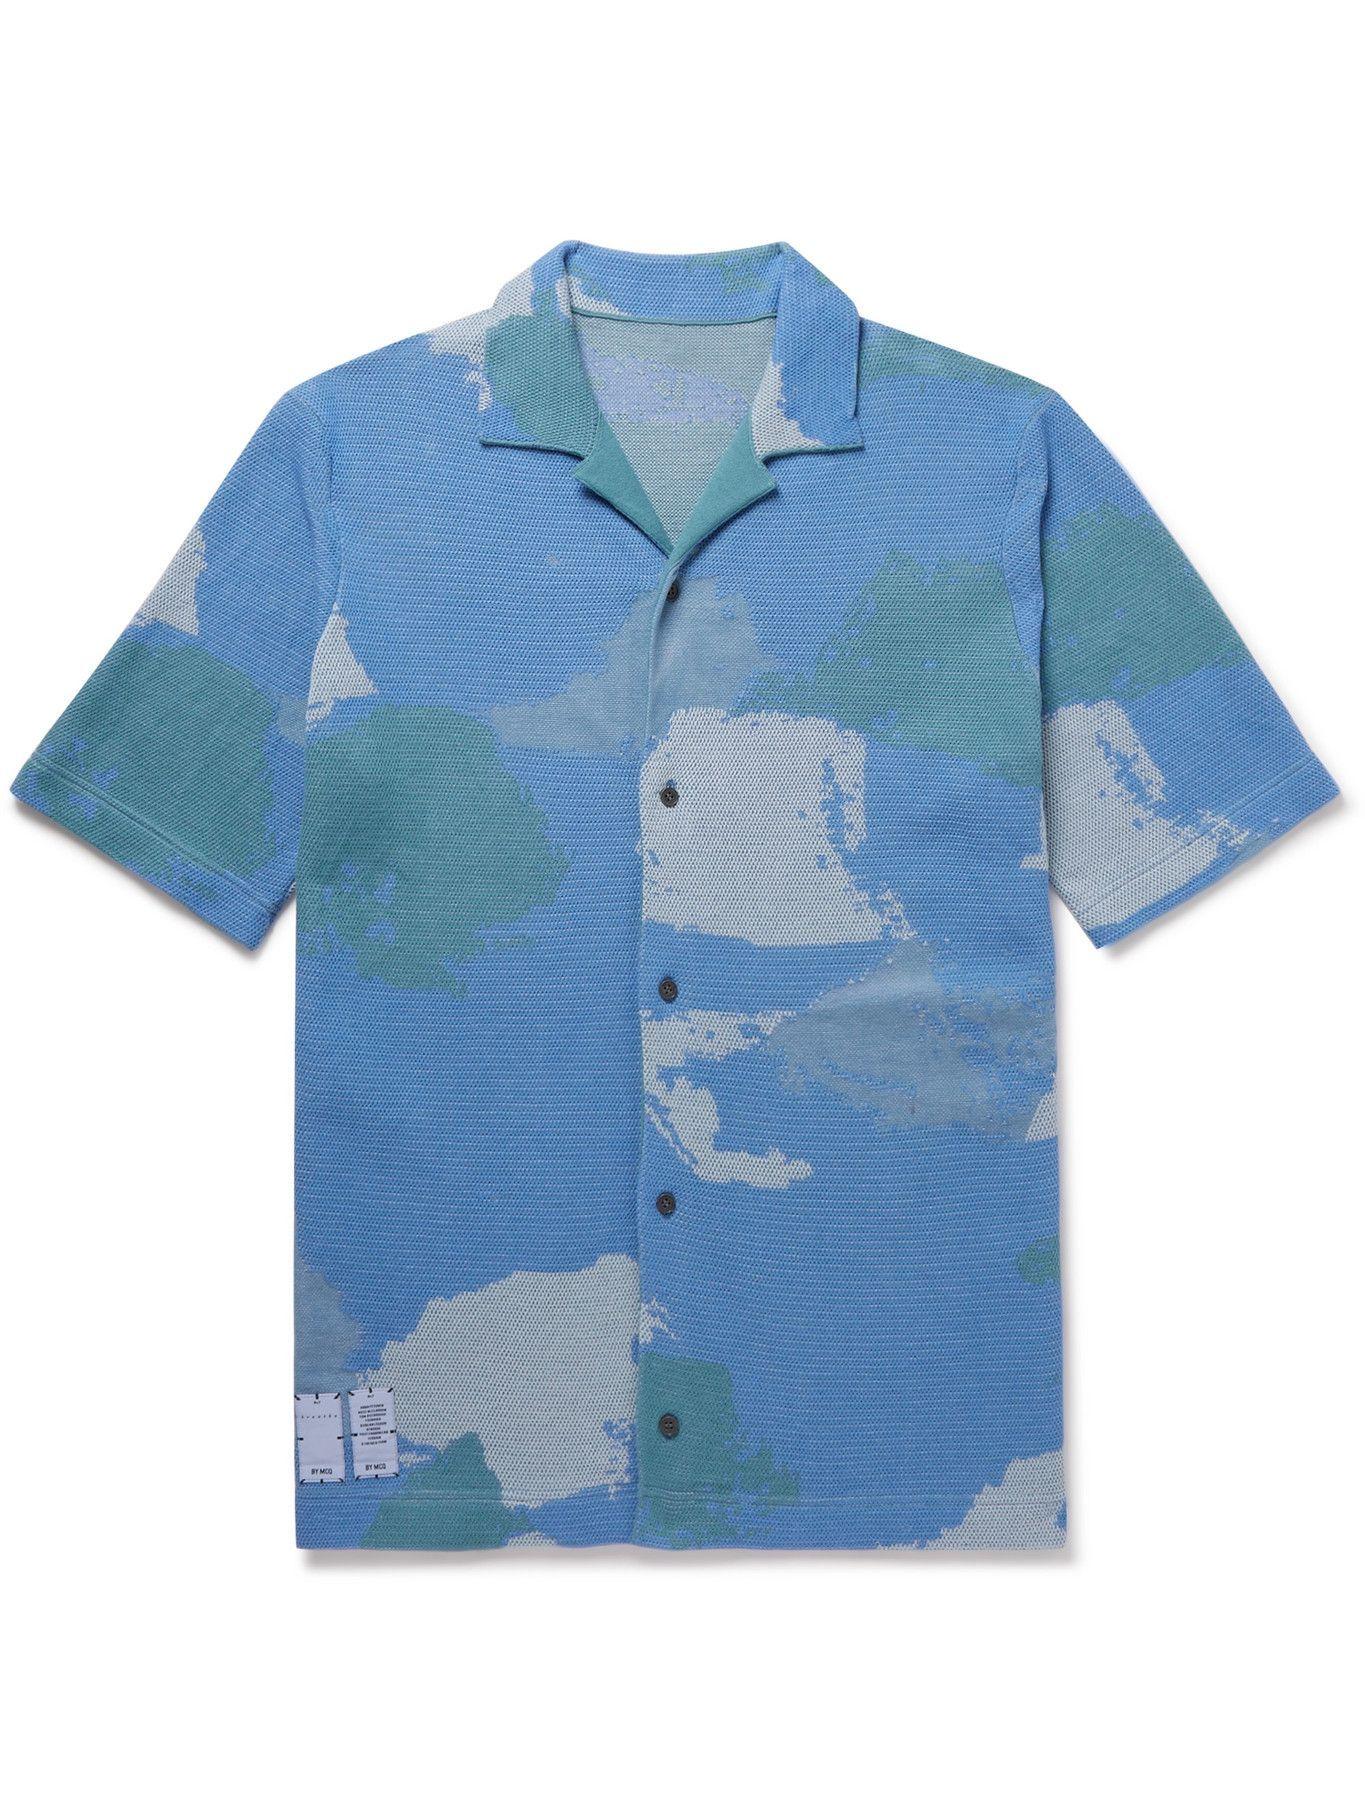 MCQ - Breathe Camp-Collar Intarsia-Knit Cotton-Blend Shirt - Blue